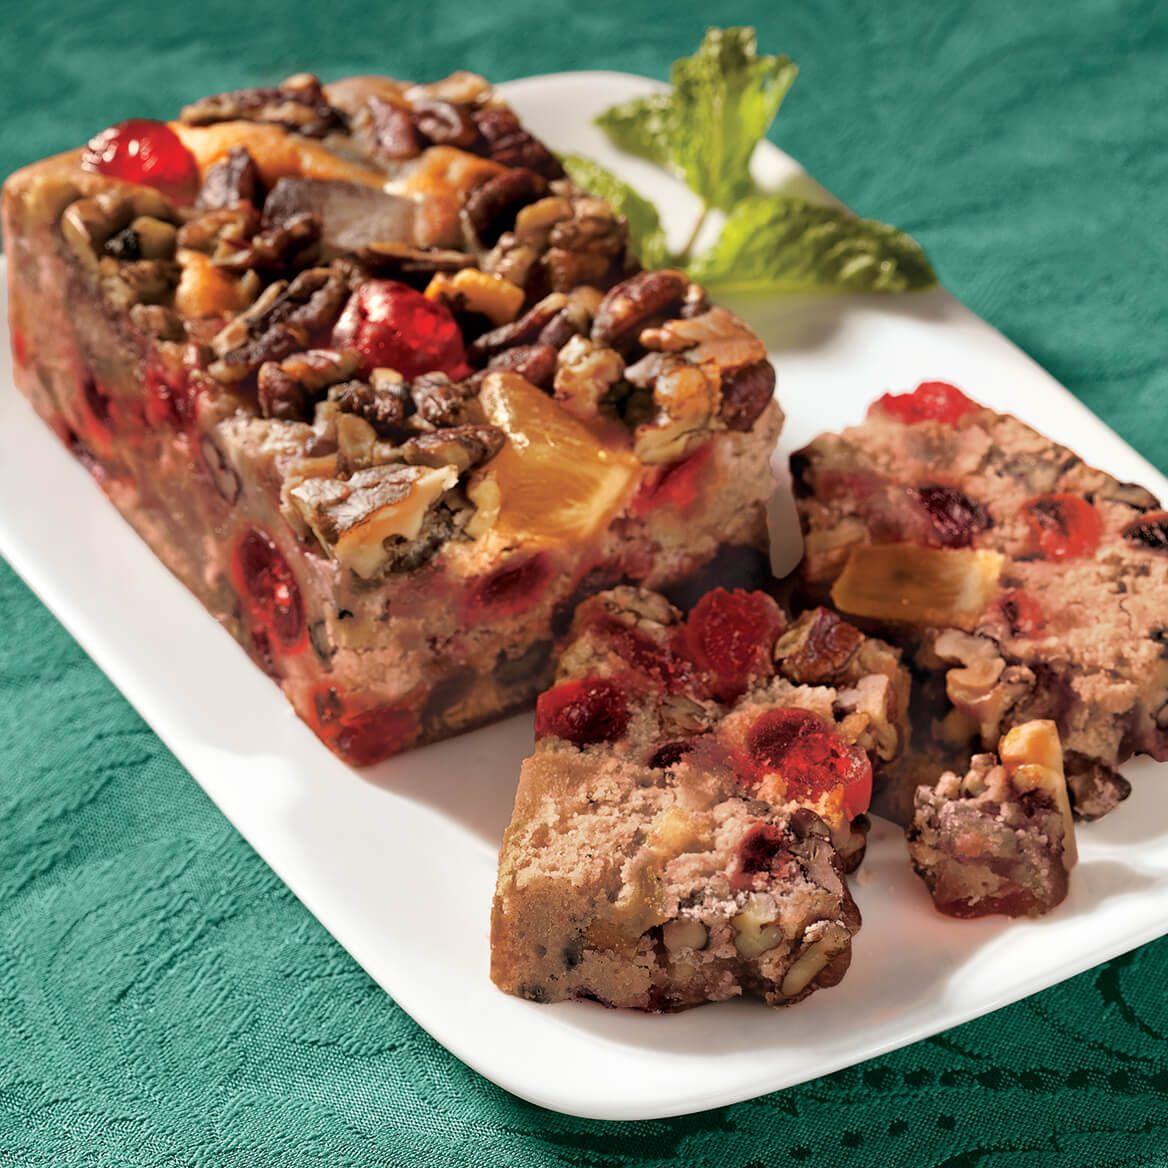 Mrs. Kimballs No Sugar Added Fruit Cake 16 oz.-331649